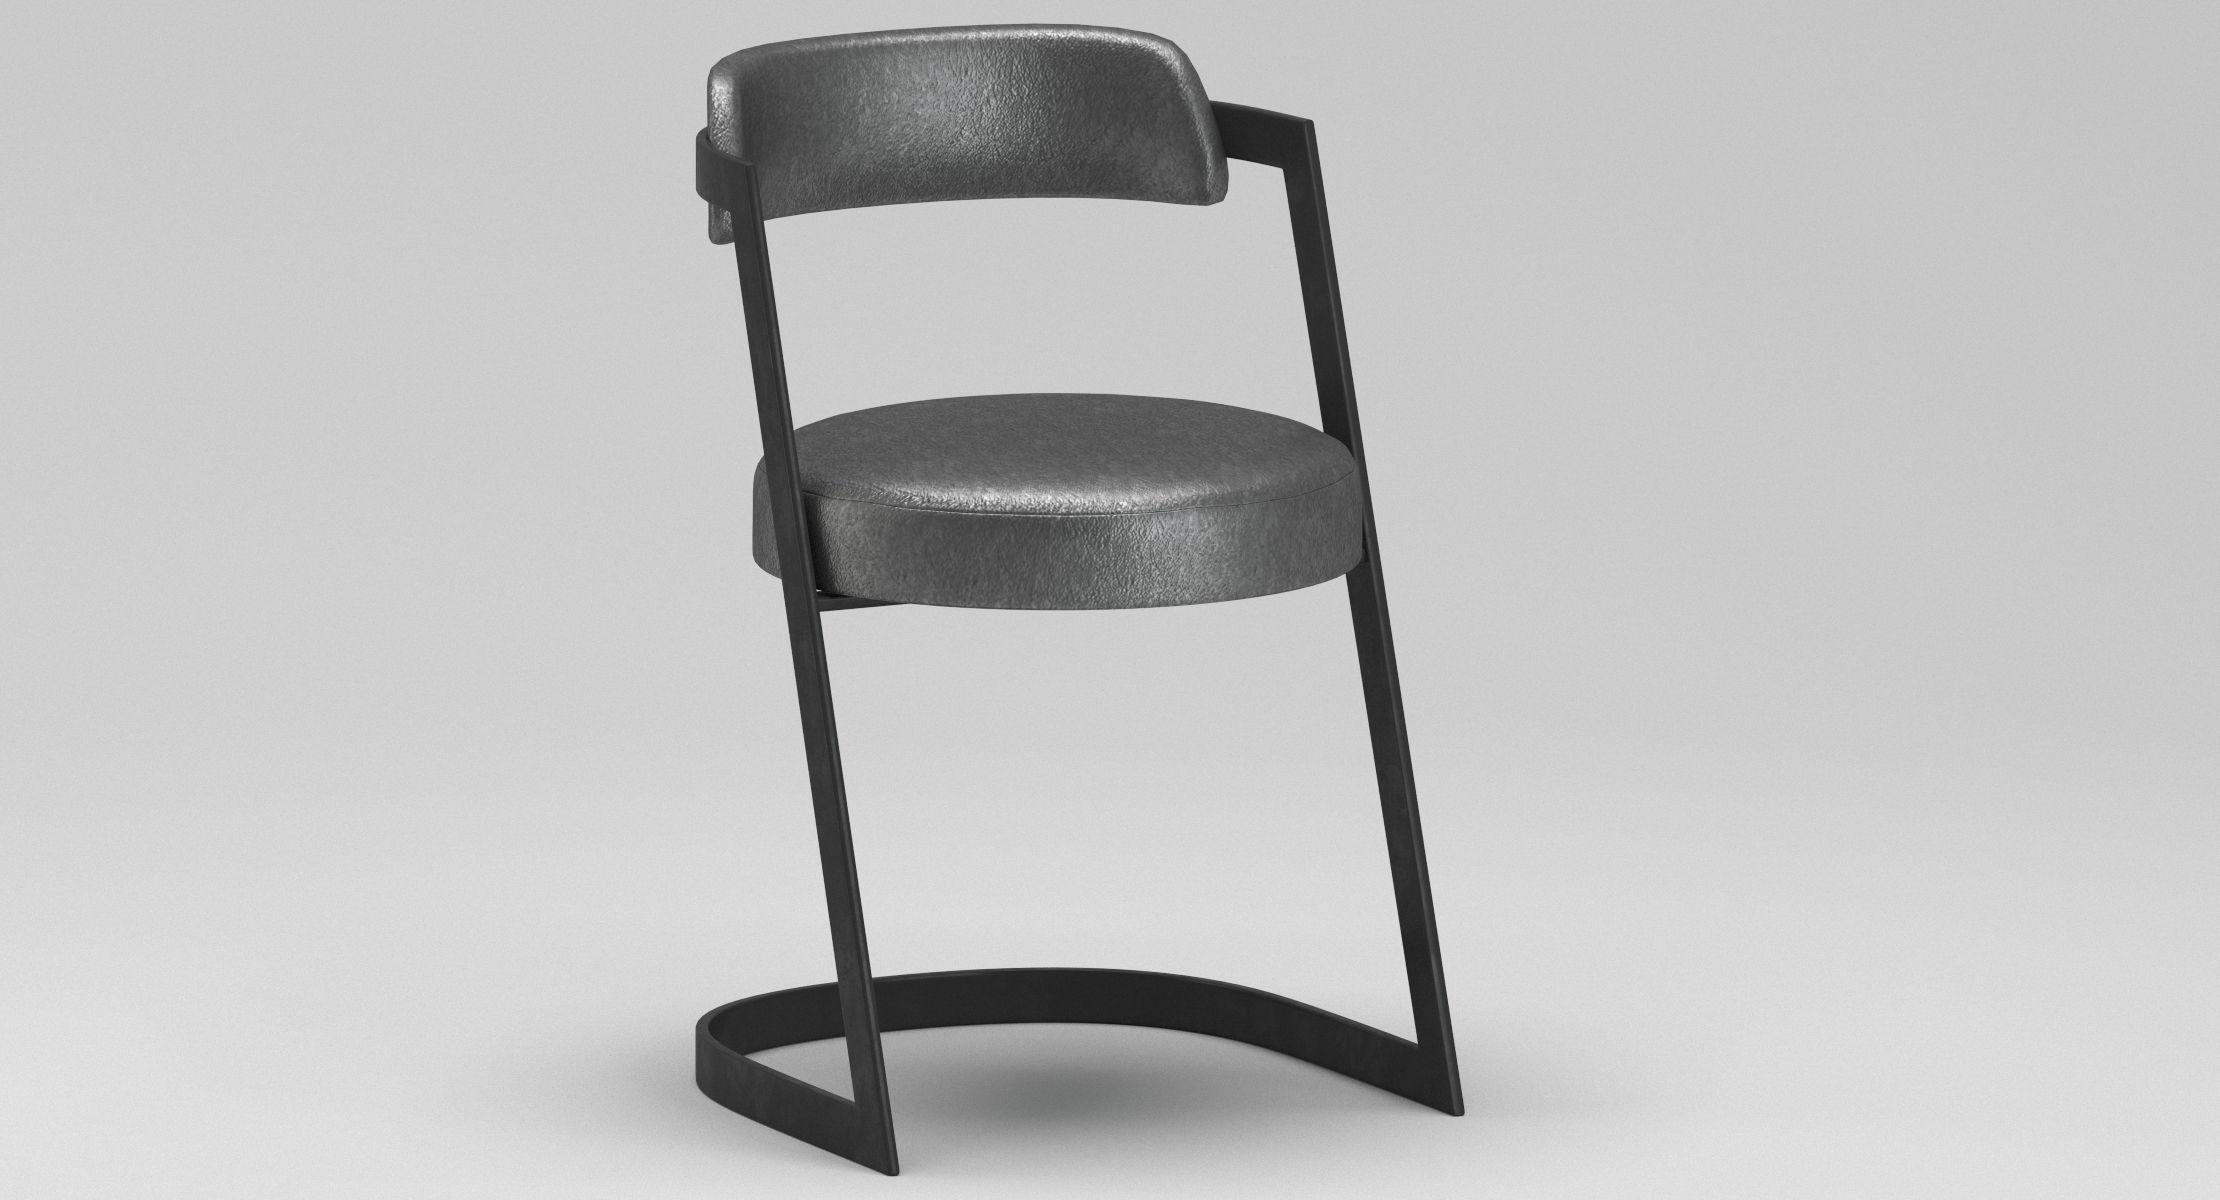 Studio Dining Chair Kelly Wearstler